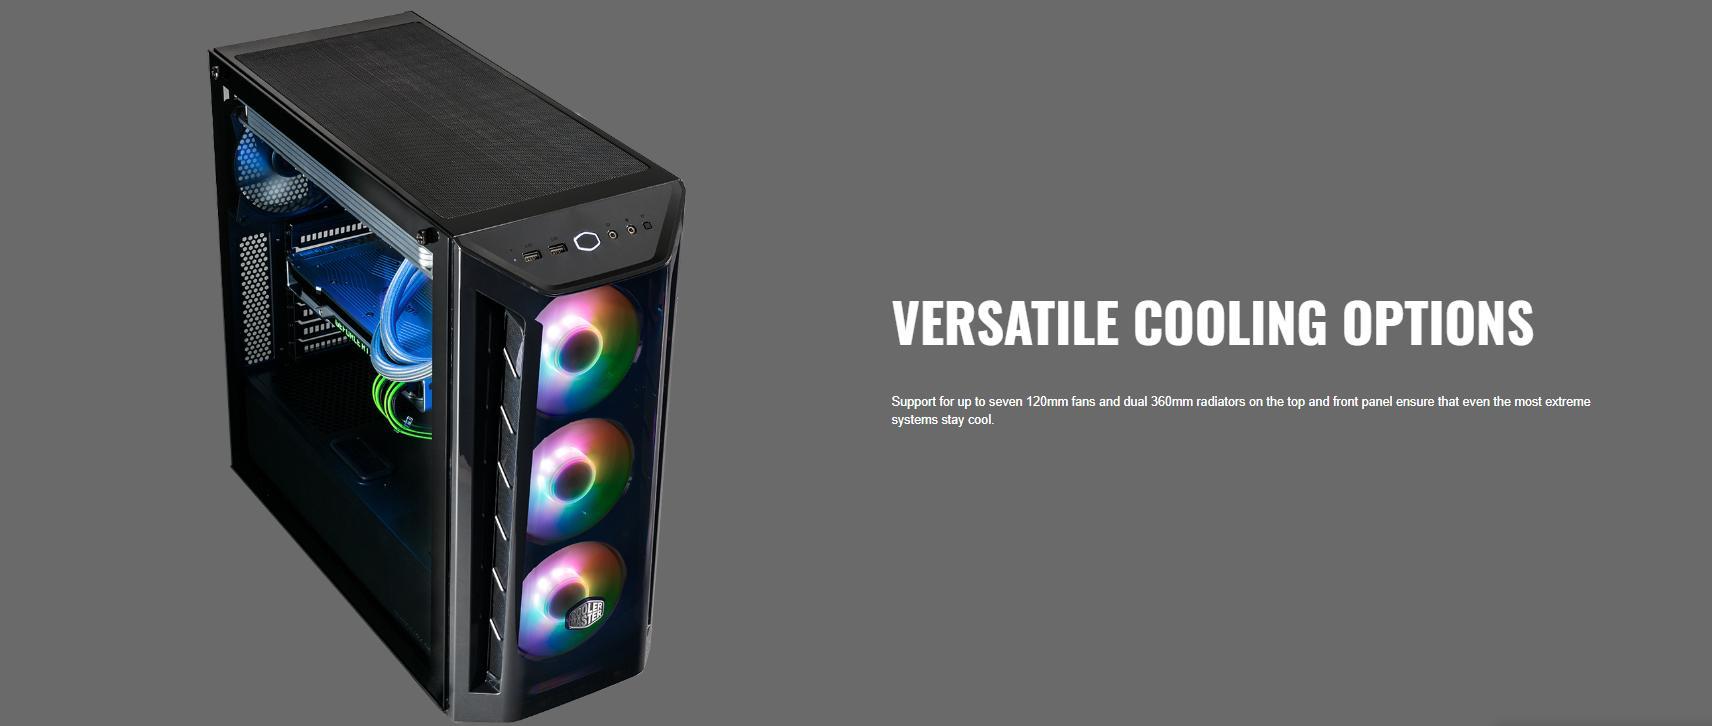 Cooler Master MasterBox MB520 ARGB giới thiệu 6